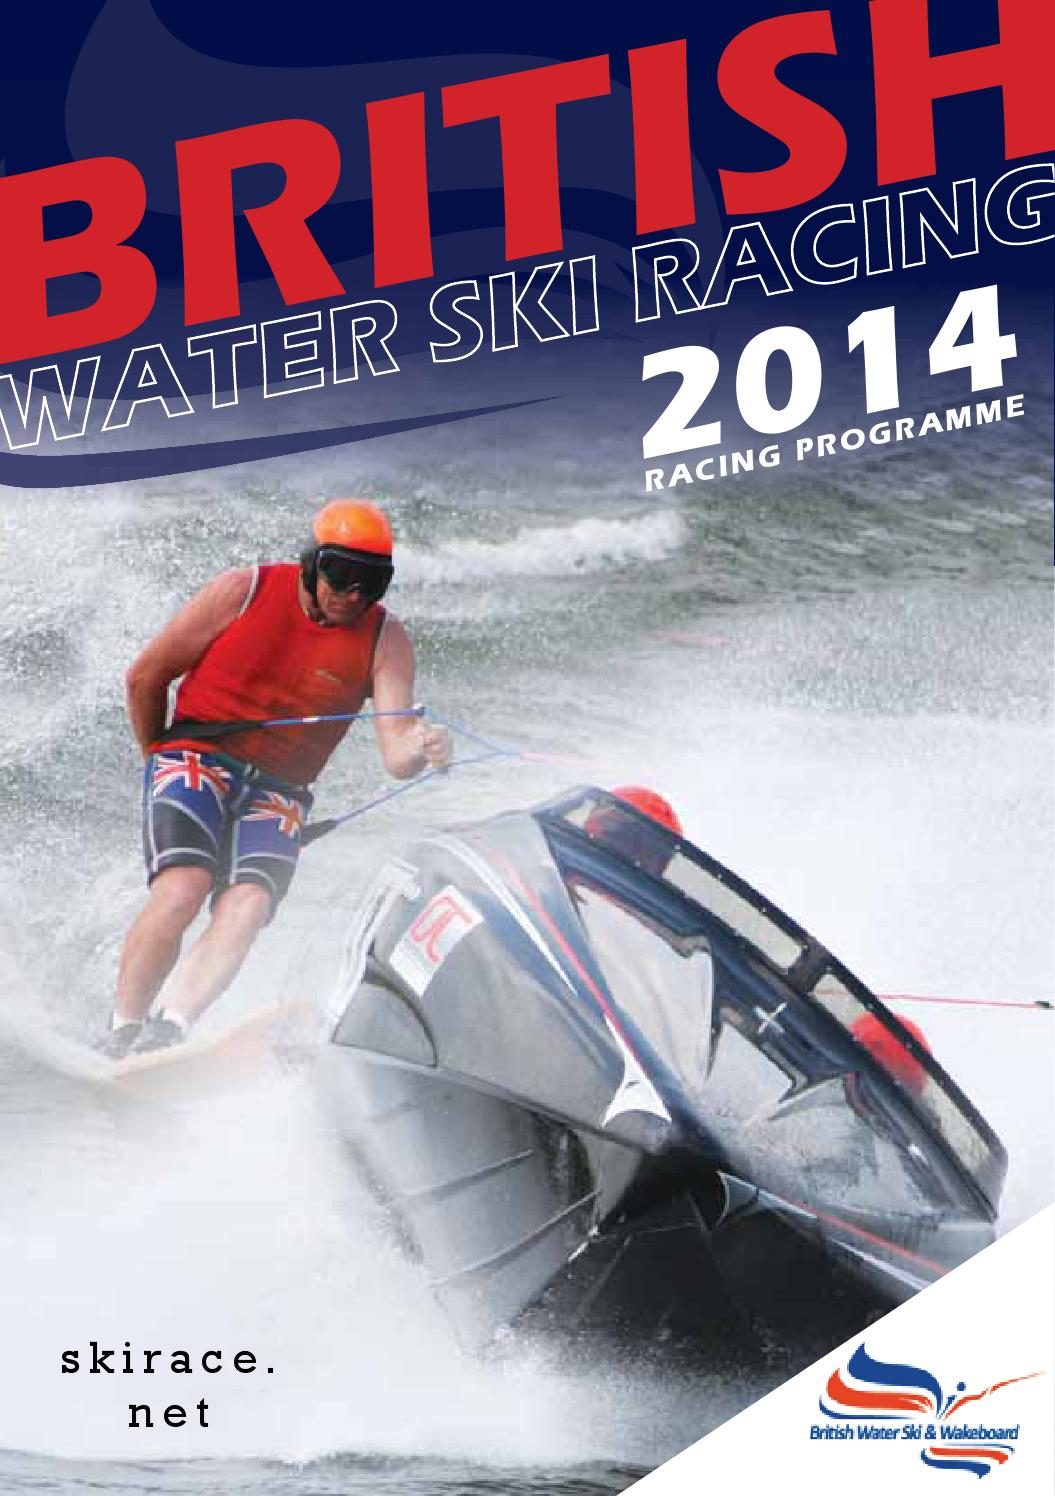 British Water Ski Racing Programme 2014 By Tina Veater Issuu